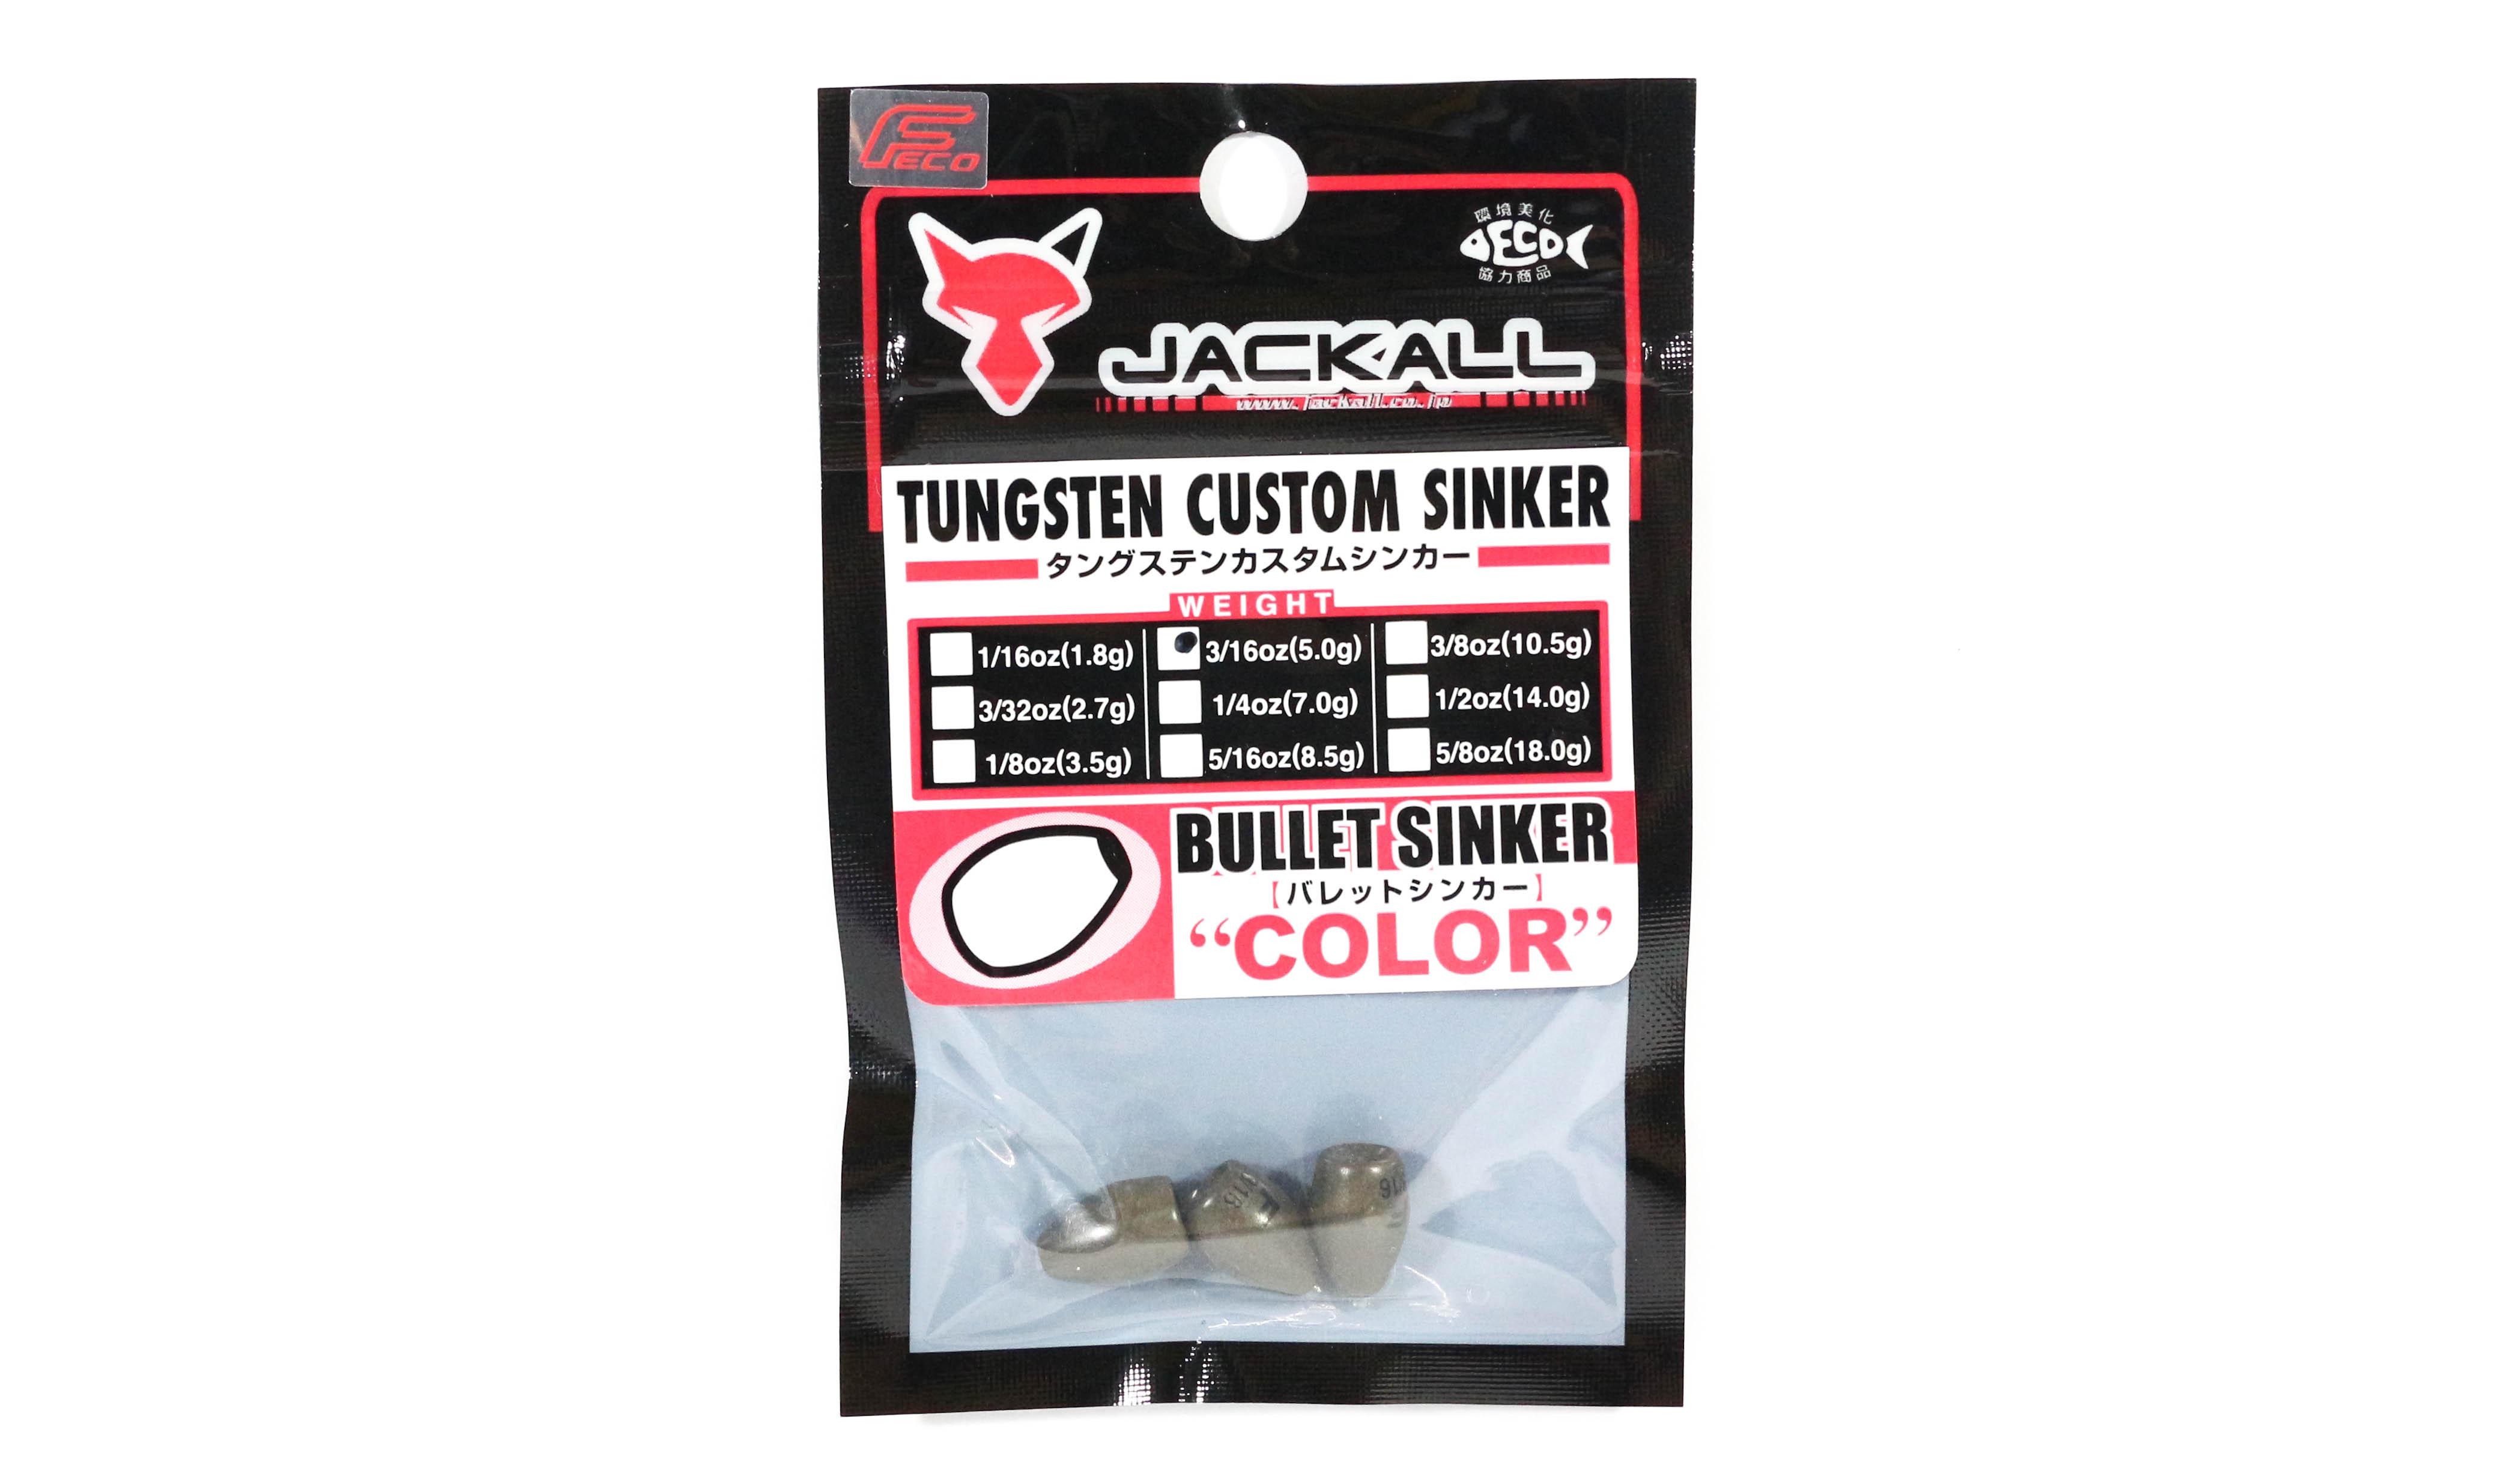 Jackall Tungsten Bullet Sinker Color 5 Grams - 3 Pcs Per Pack (5466)